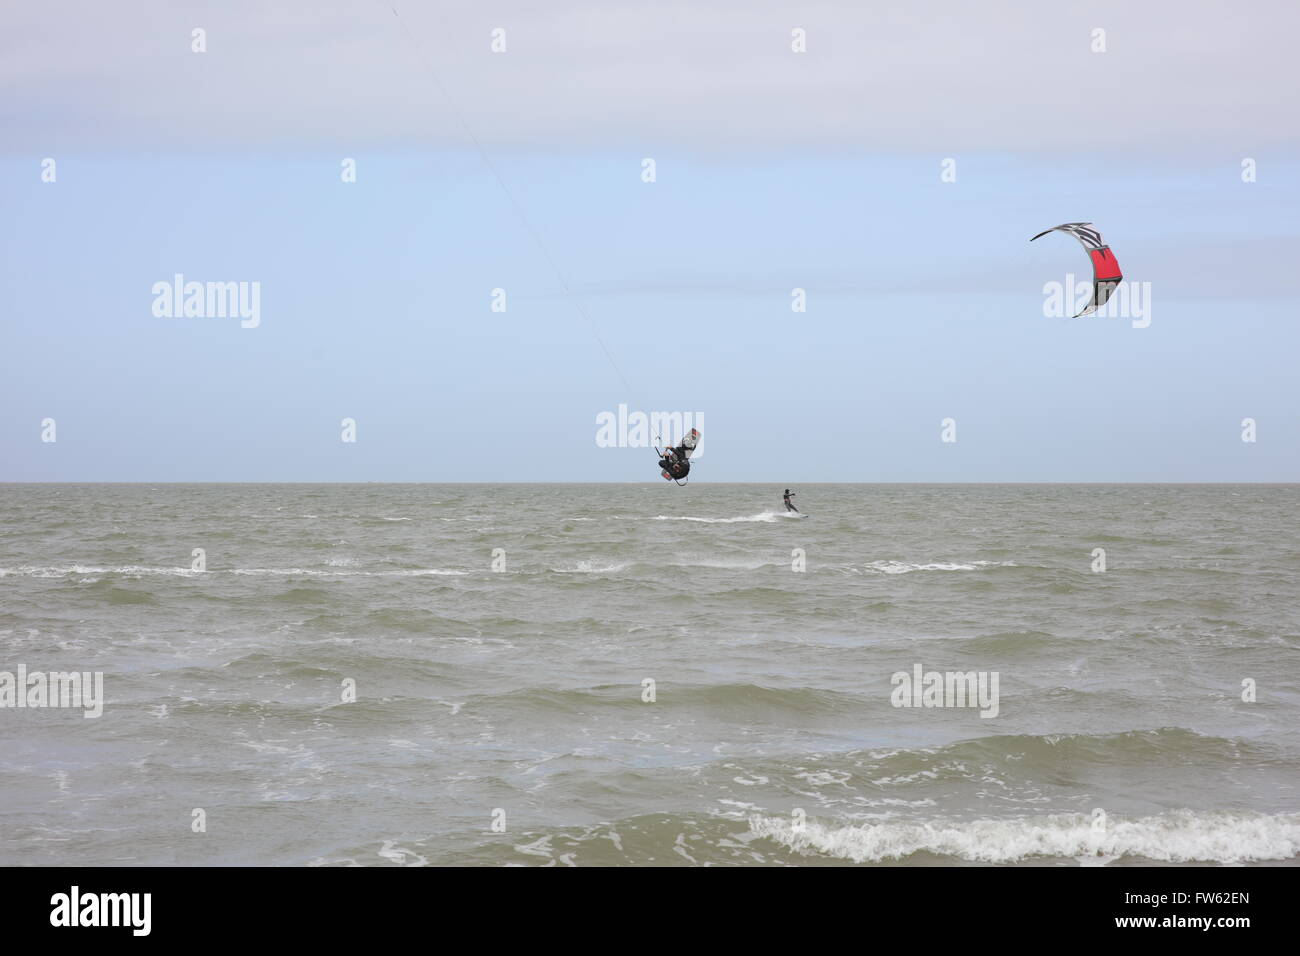 Kite Surfer(s) at Brouwersdam, 4323 Ellemeet, Netherlands Stock Photo